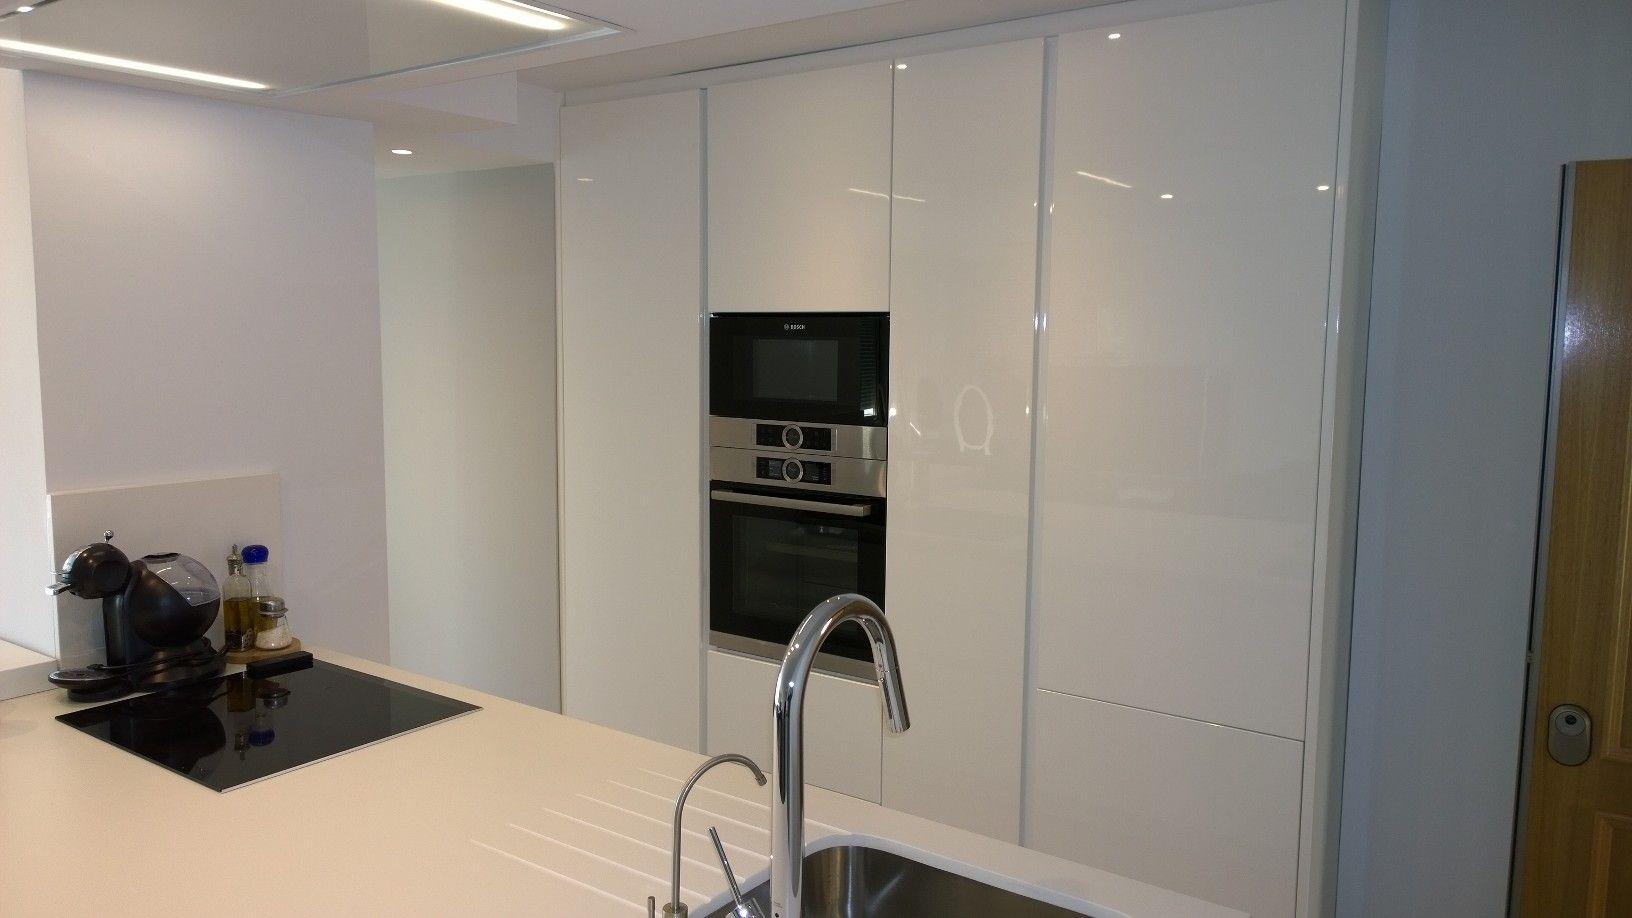 Cocina de 2a kutchen modelo nua lacado blanco brillo for Cocinas completas con electrodomesticos